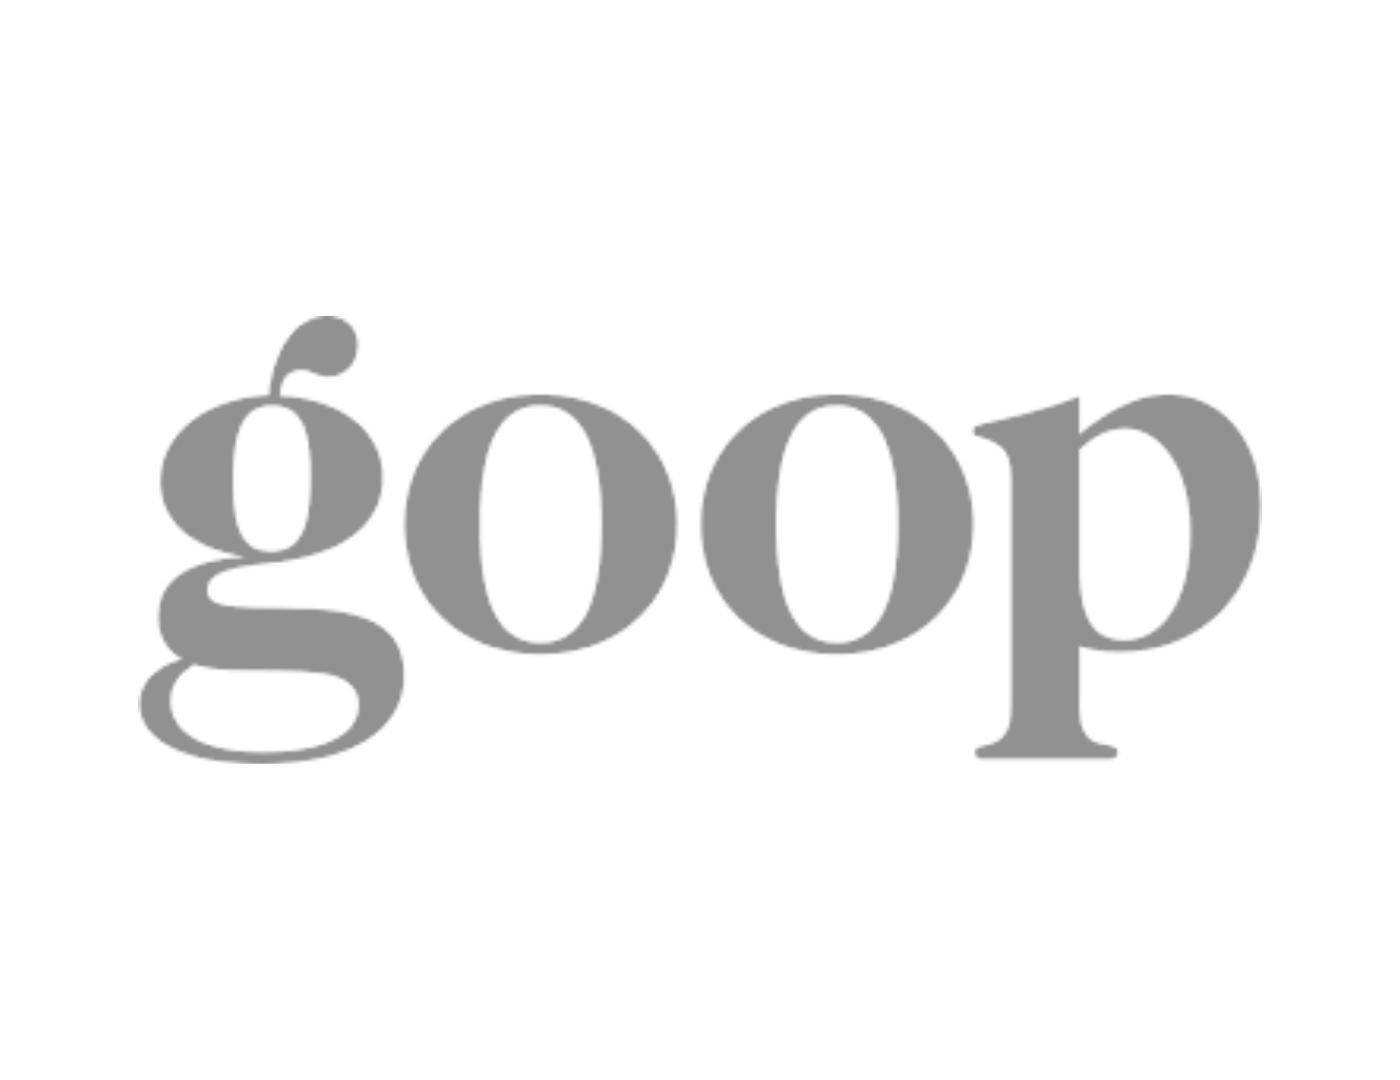 gooplogo